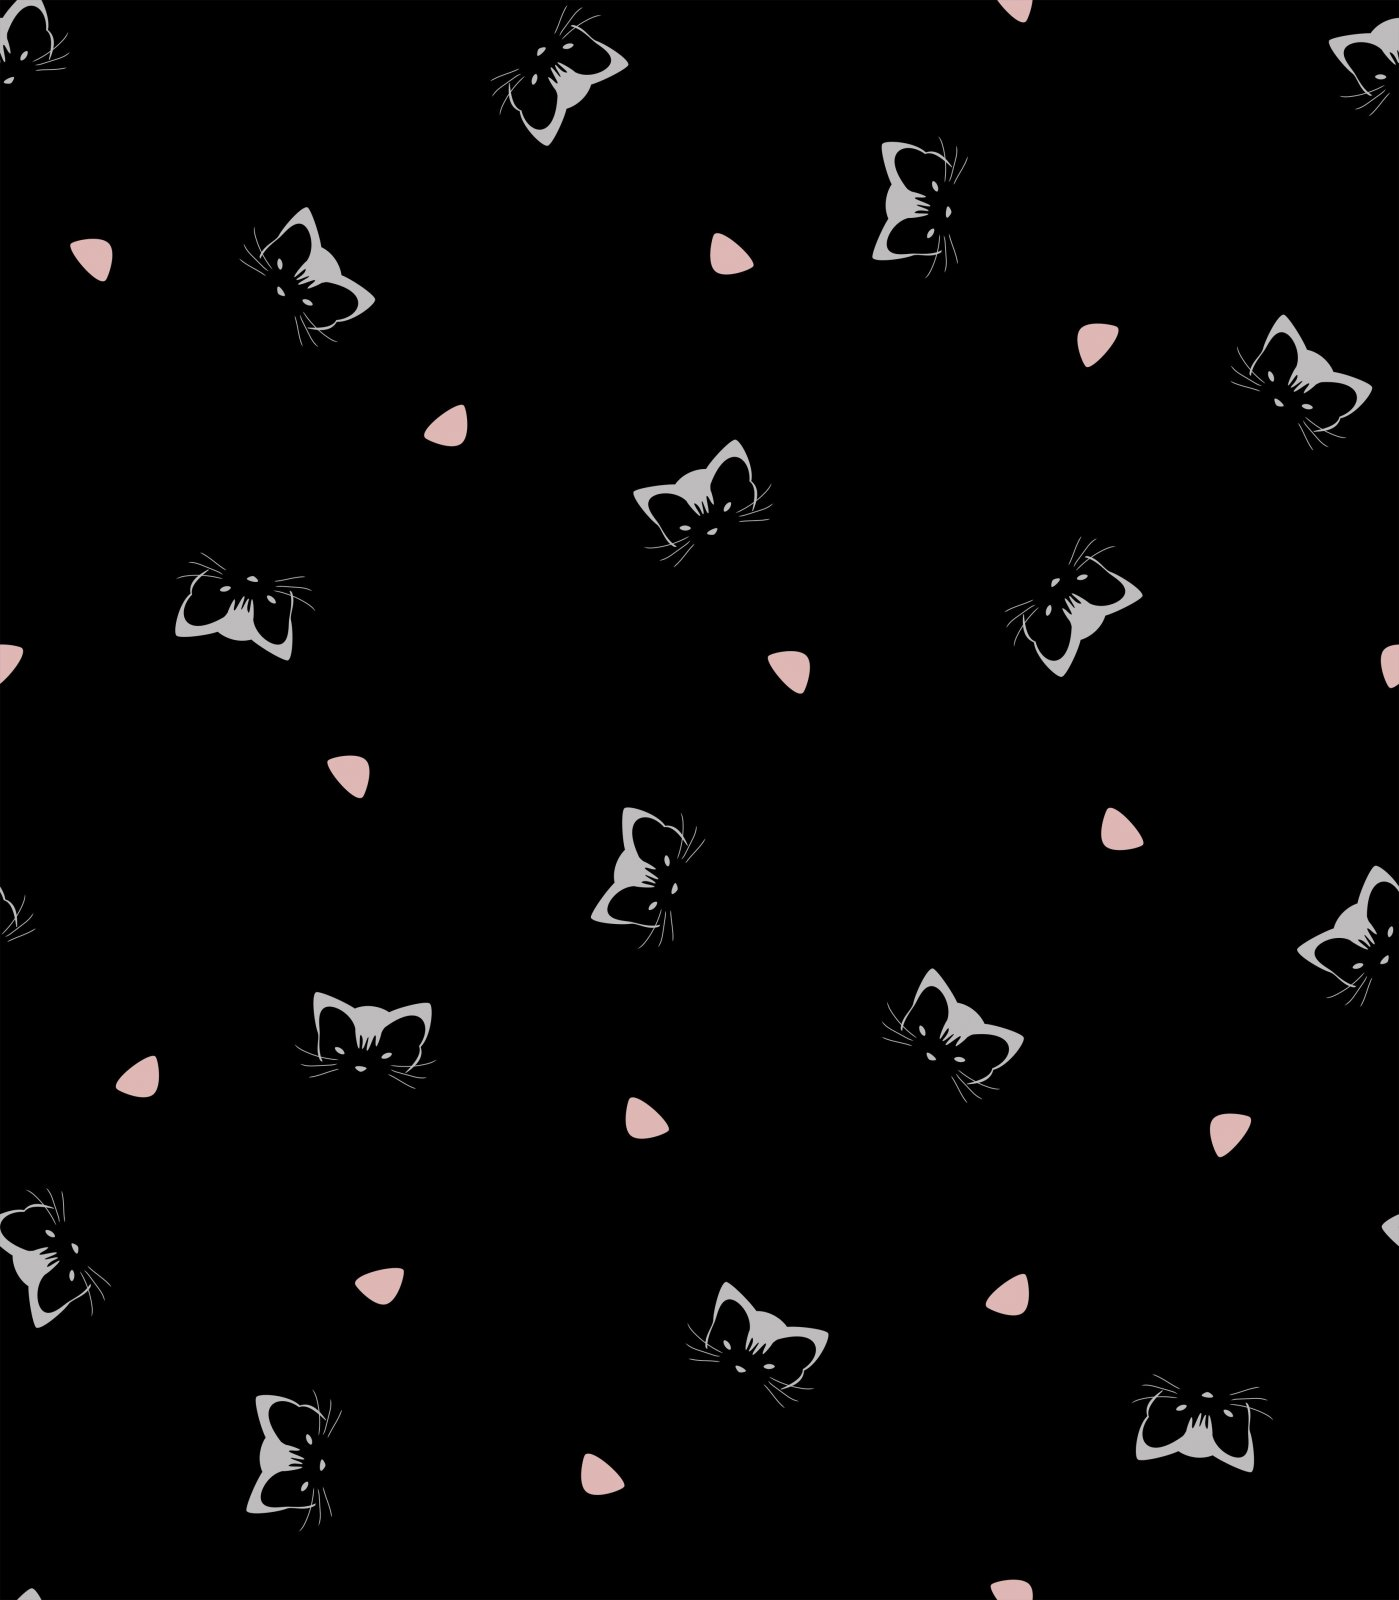 Fabric Stof Avalana Jersey - Kitty Faces on Black